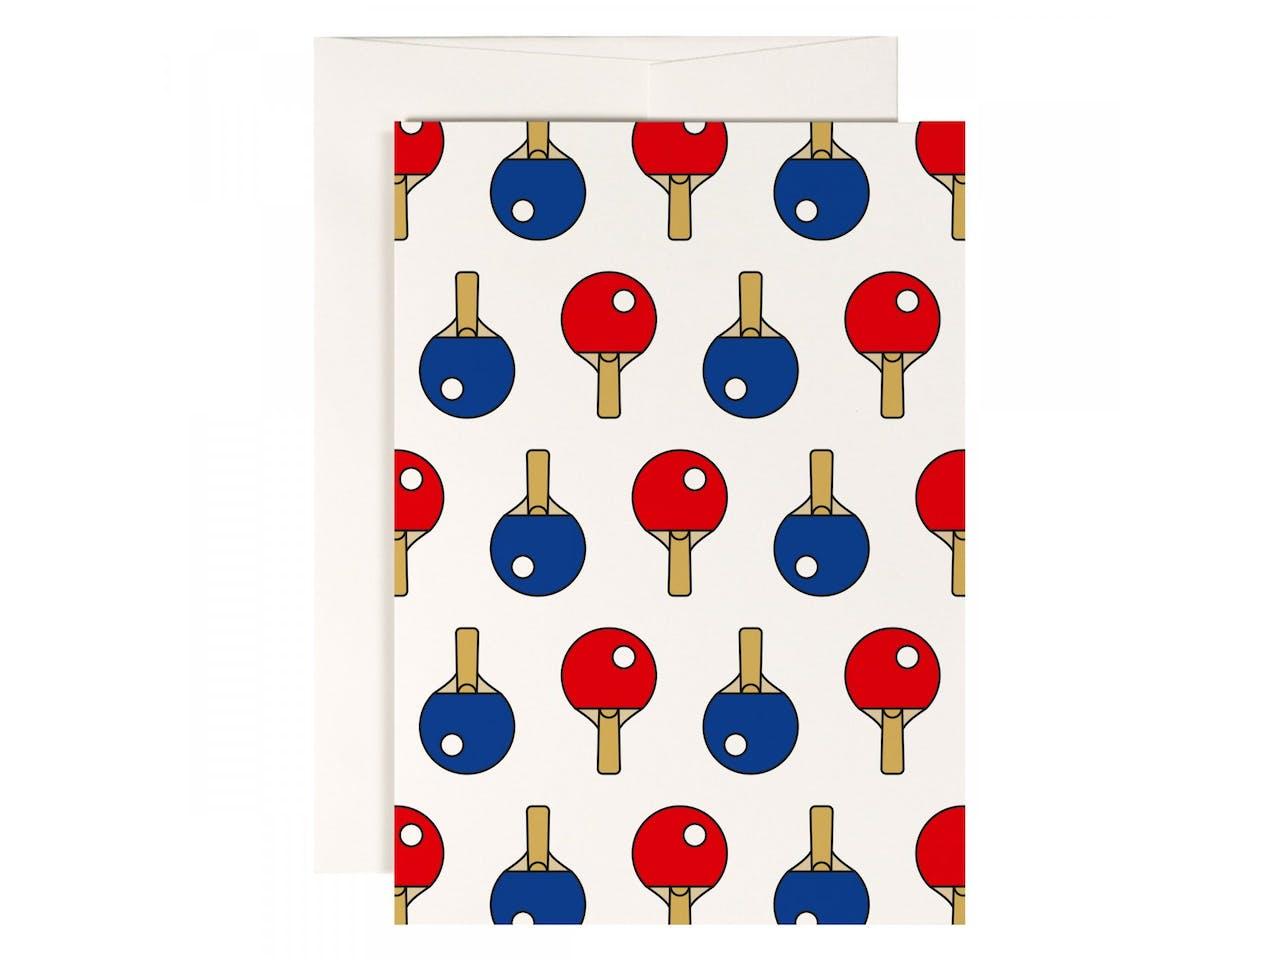 Redfries Grußkarte, DIN A6/C6, Klappkarte mit Kuvert, Ping pong